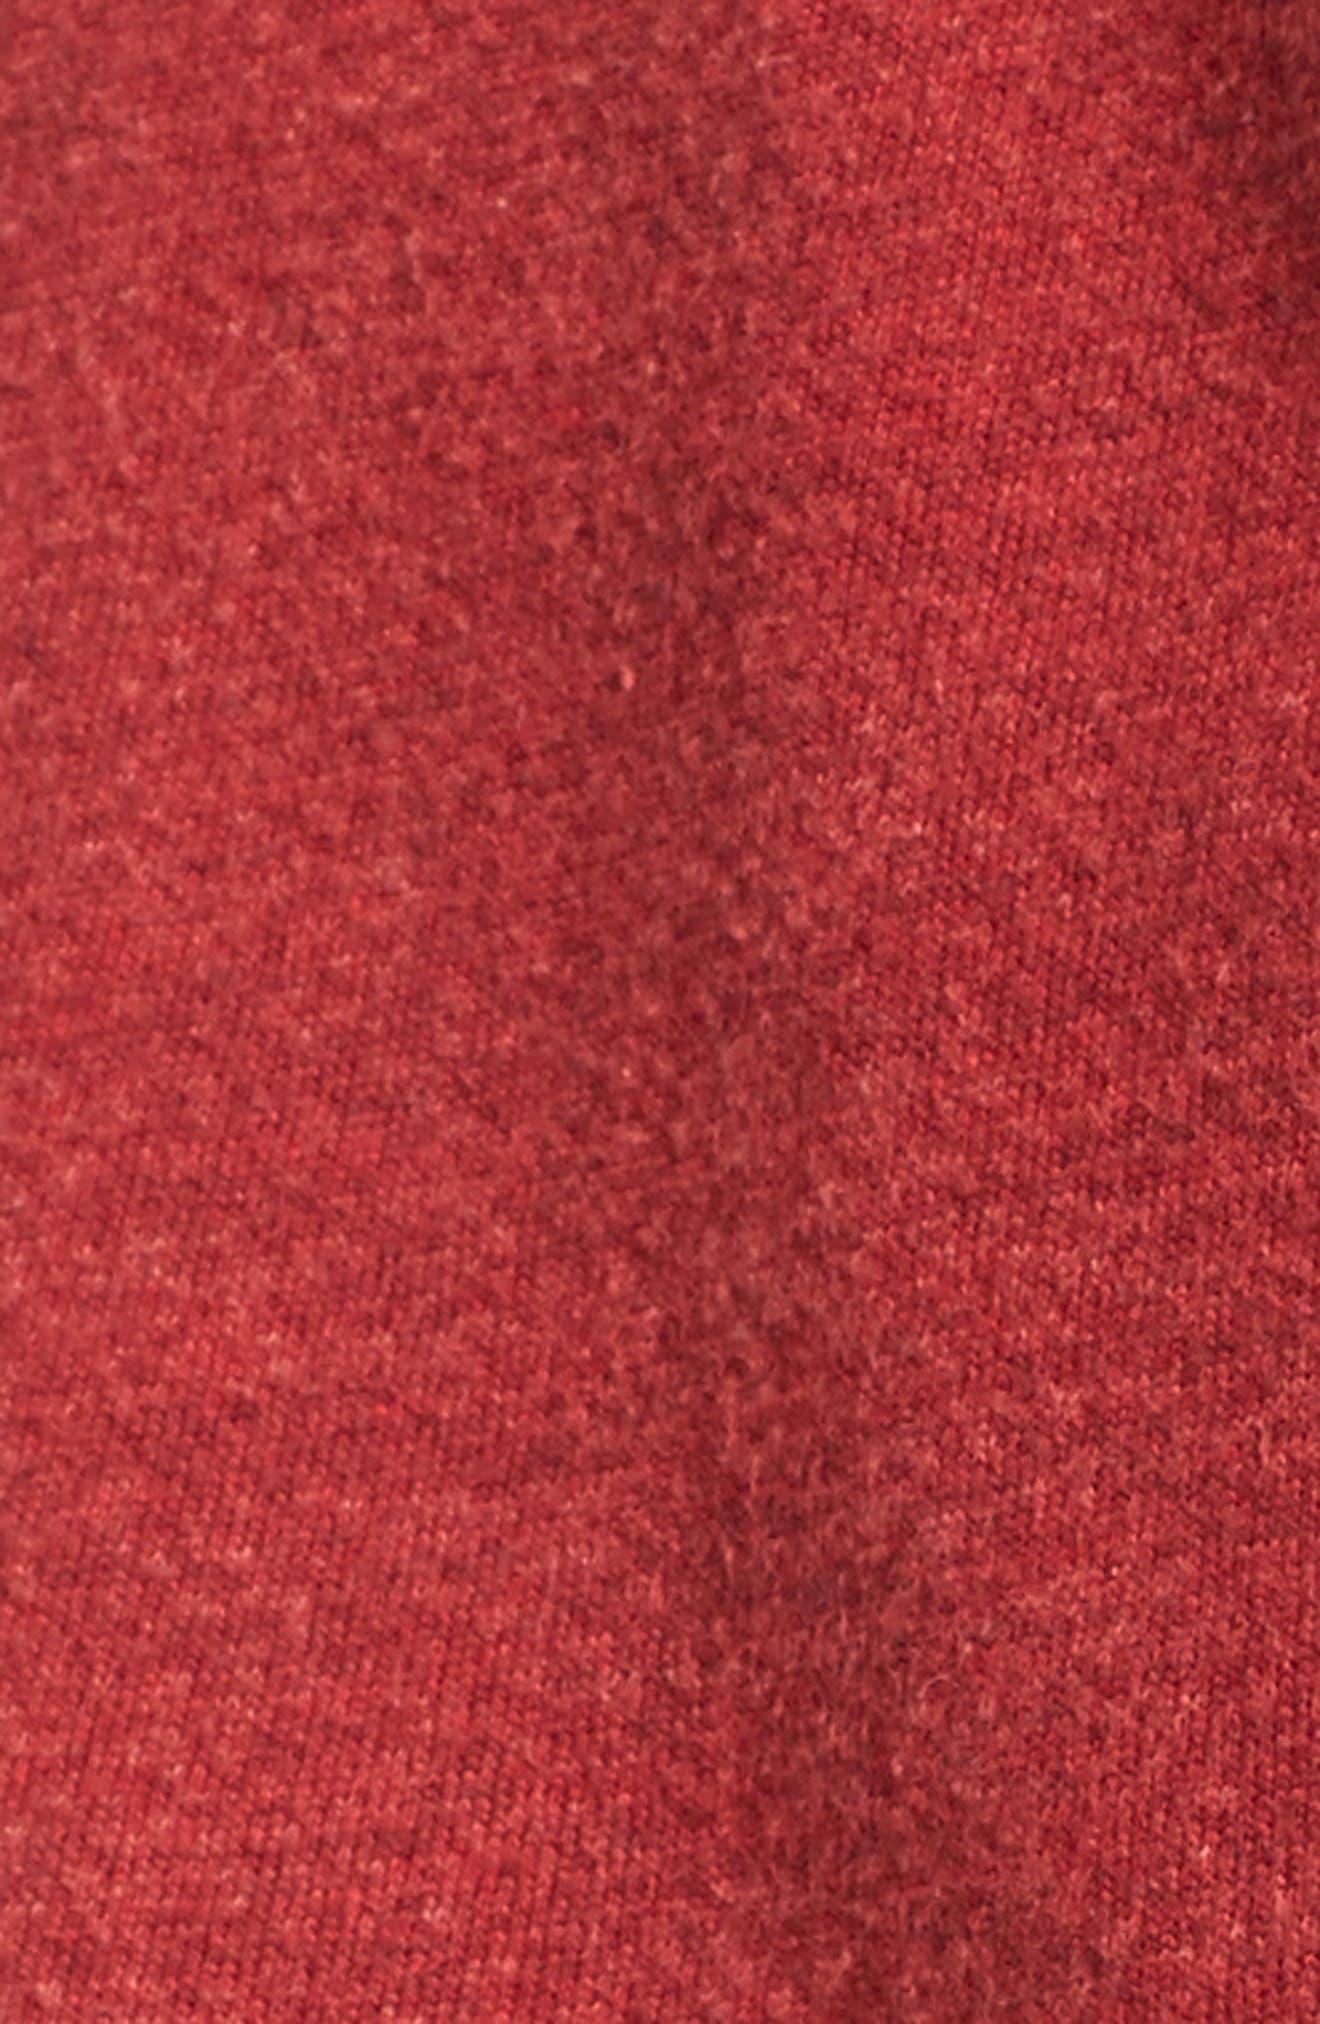 Bell Sleeve Terry Hoodie,                             Alternate thumbnail 5, color,                             Sun Faded Crimson